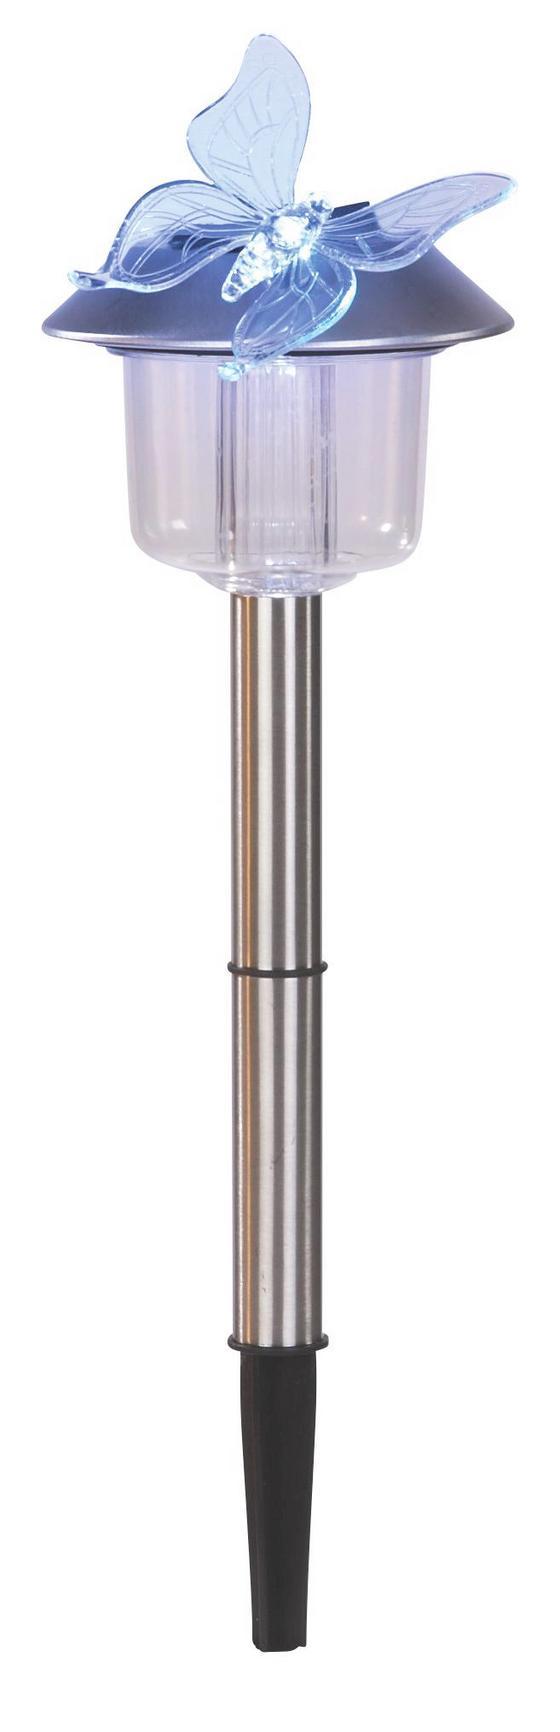 Solarleuchte Sandy - KONVENTIONELL, Kunststoff/Metall (48cm) - Homezone